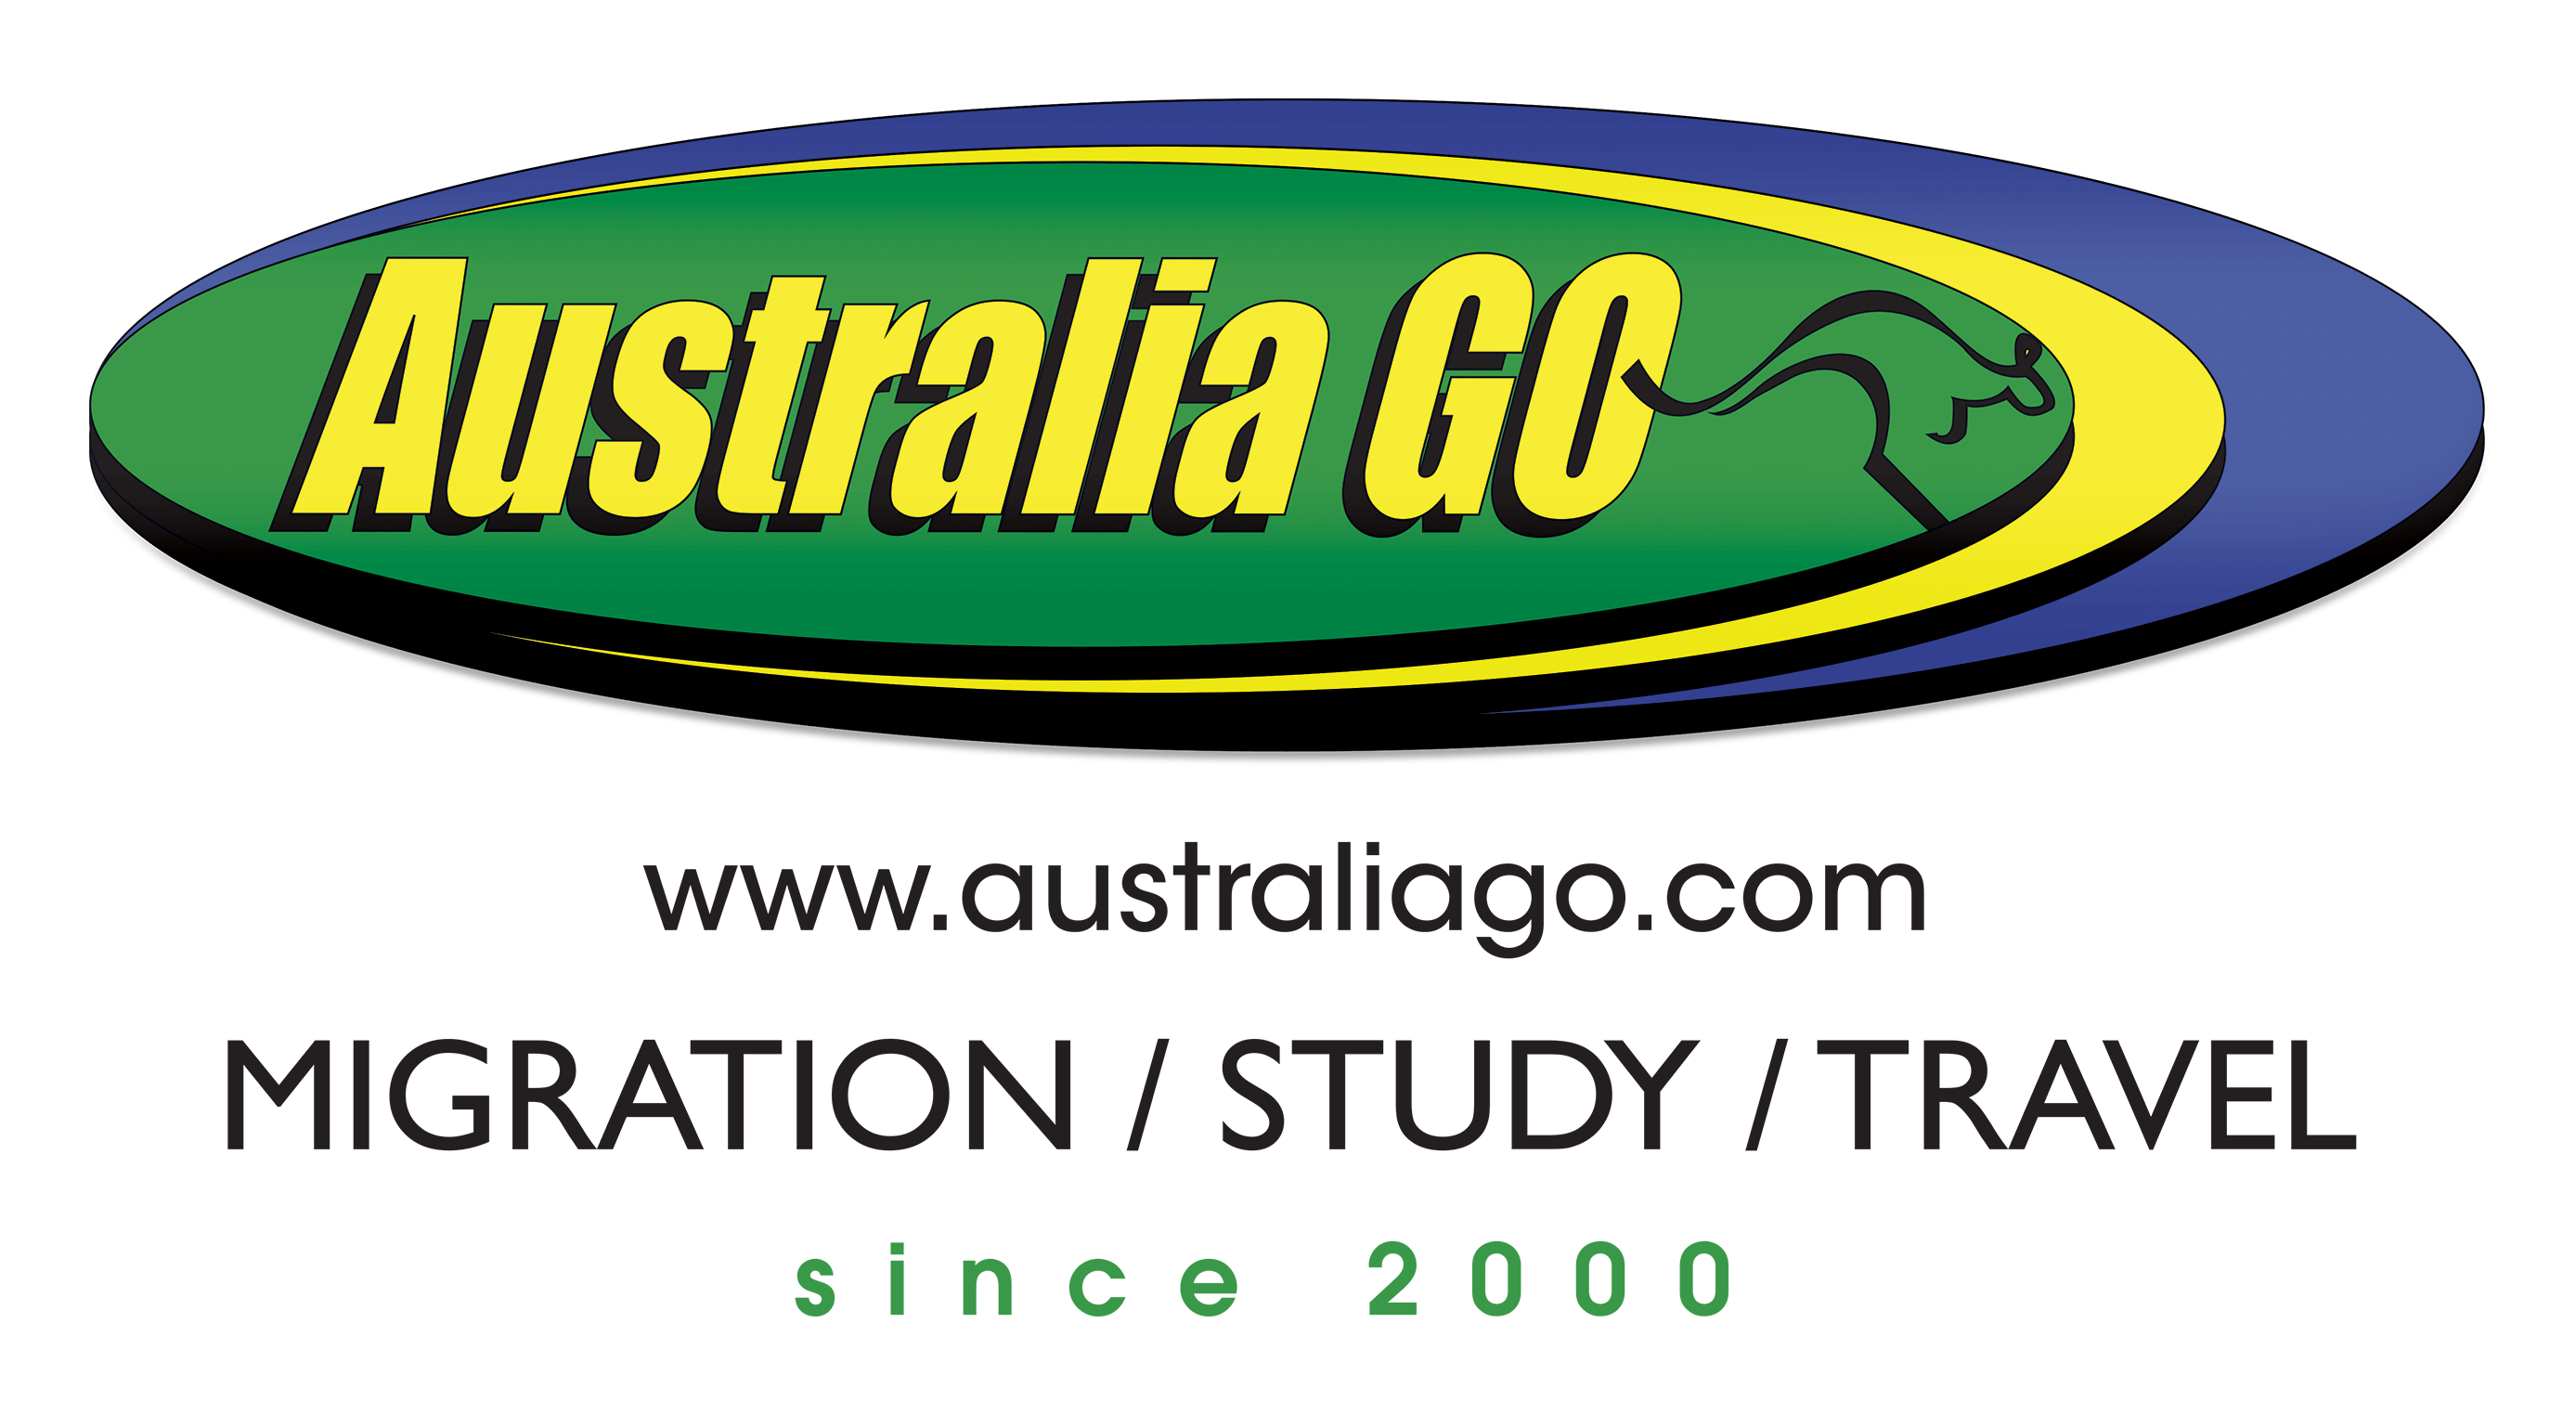 serviços australia go